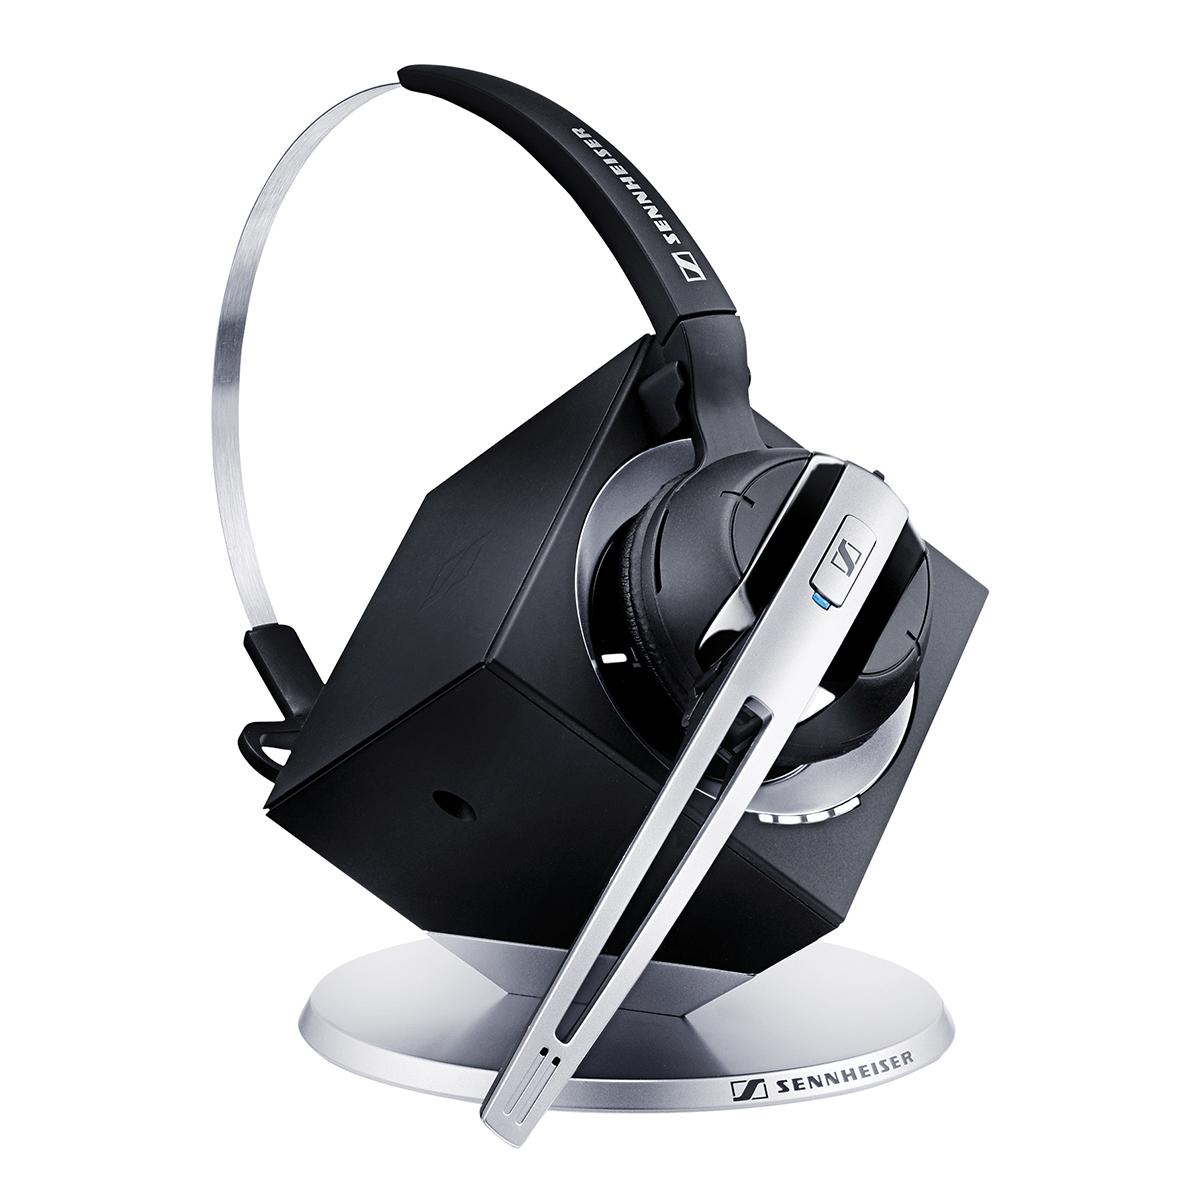 EPOS Sennheiser DW Office Phone Single Connectivity DECT Mono Headset